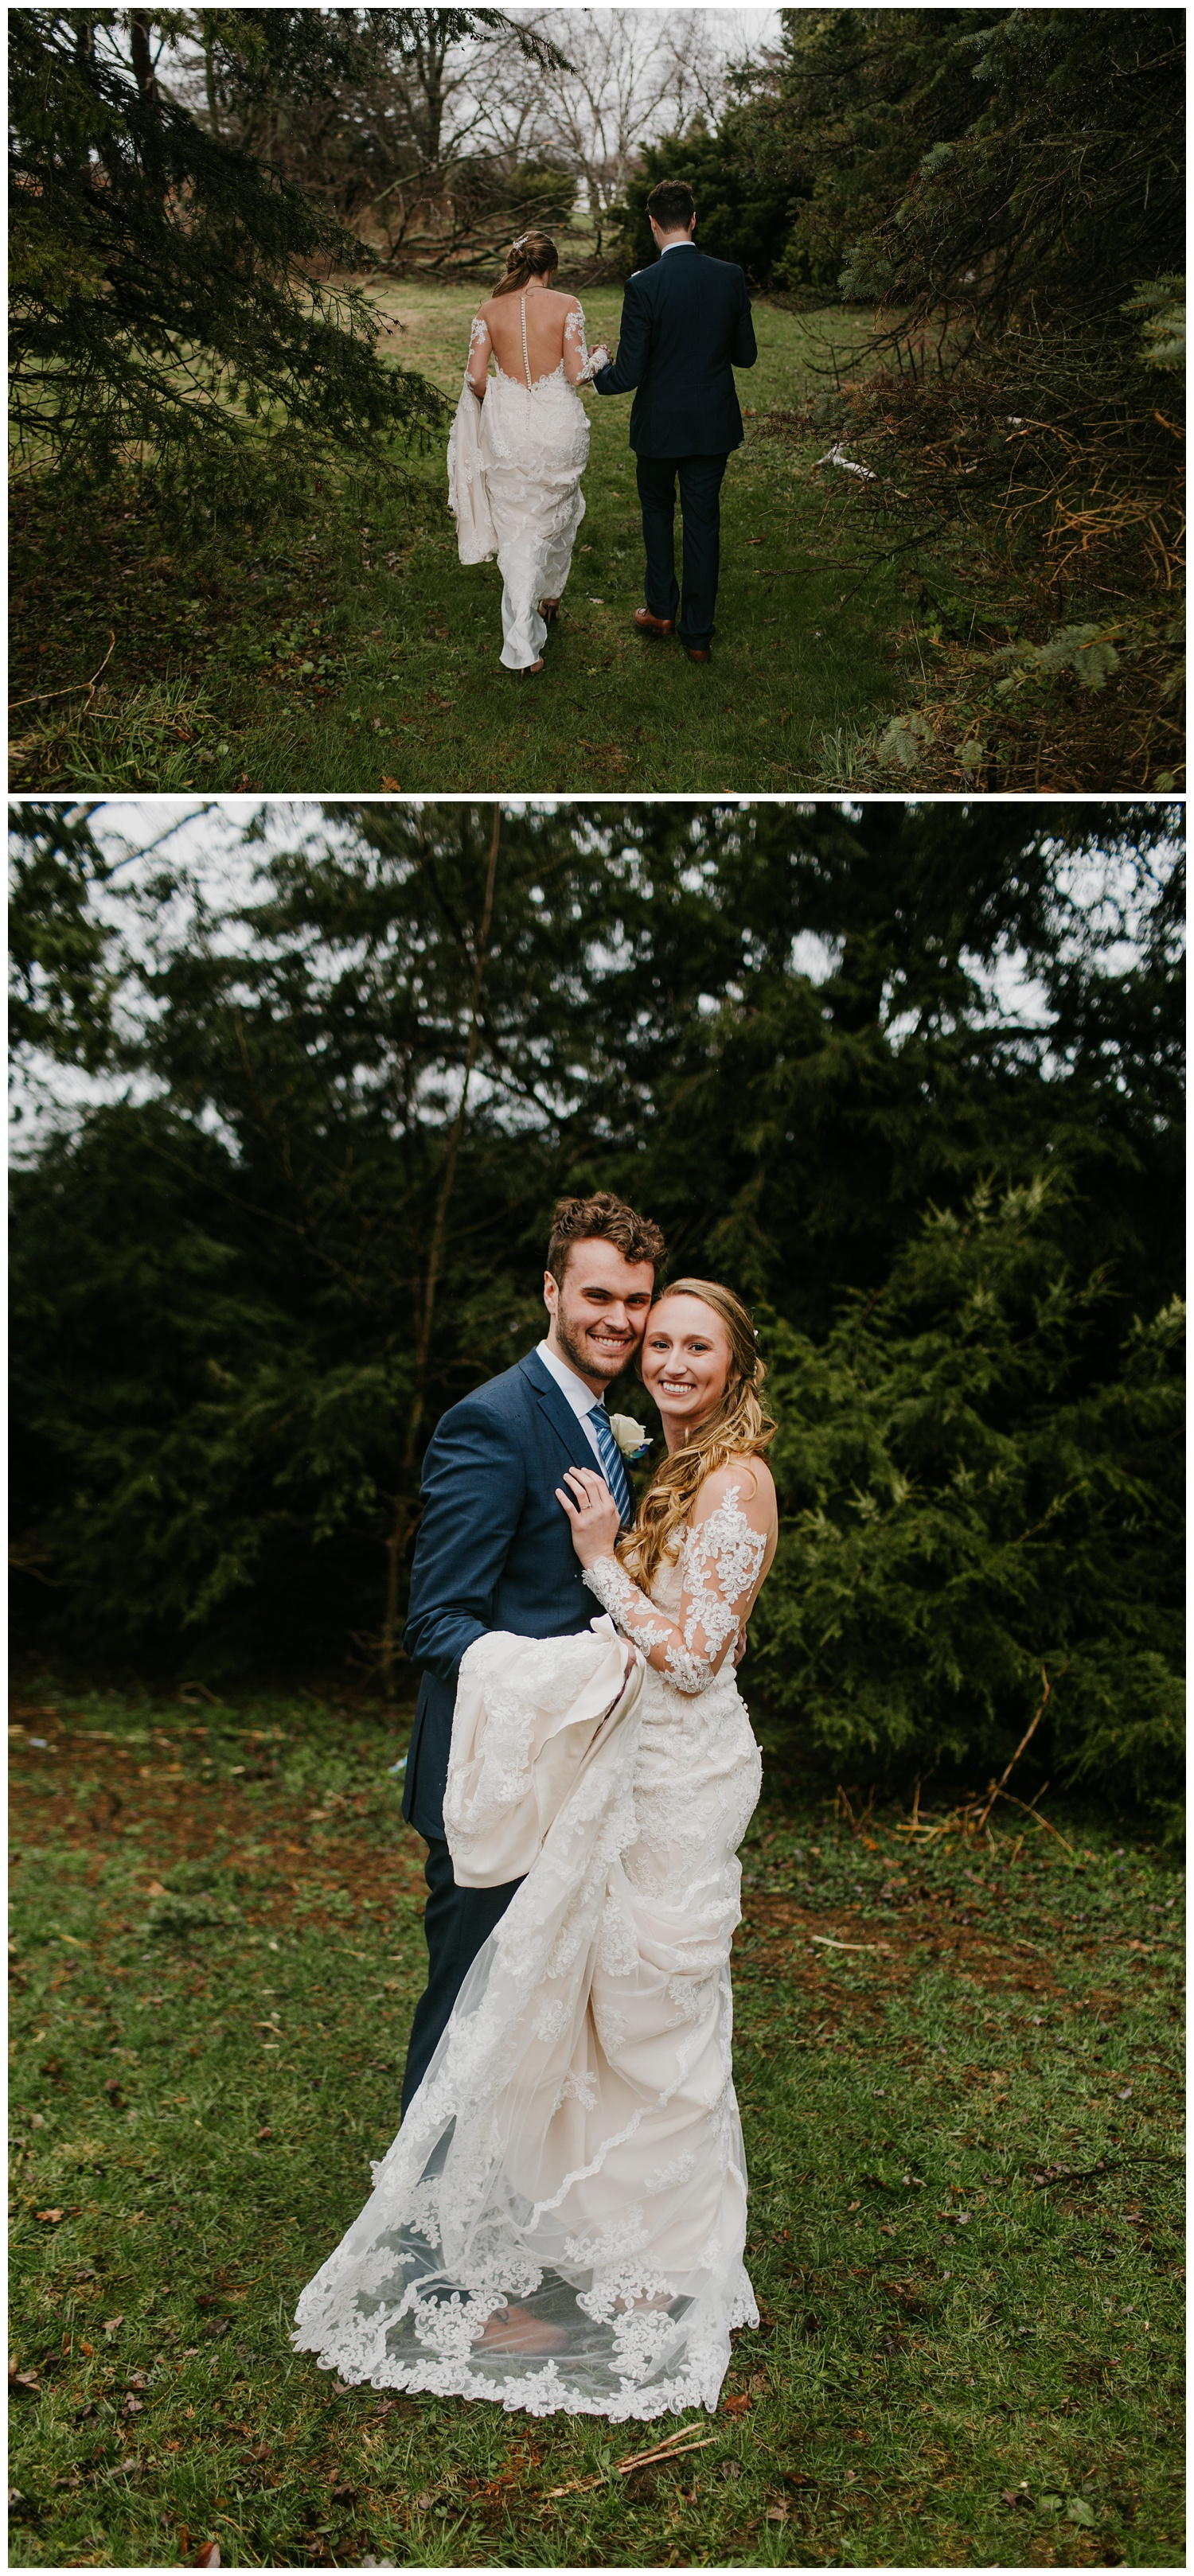 Shadowland Silver Beach St. Joseph Wedding Photographer Rainy Wedding21.jpg